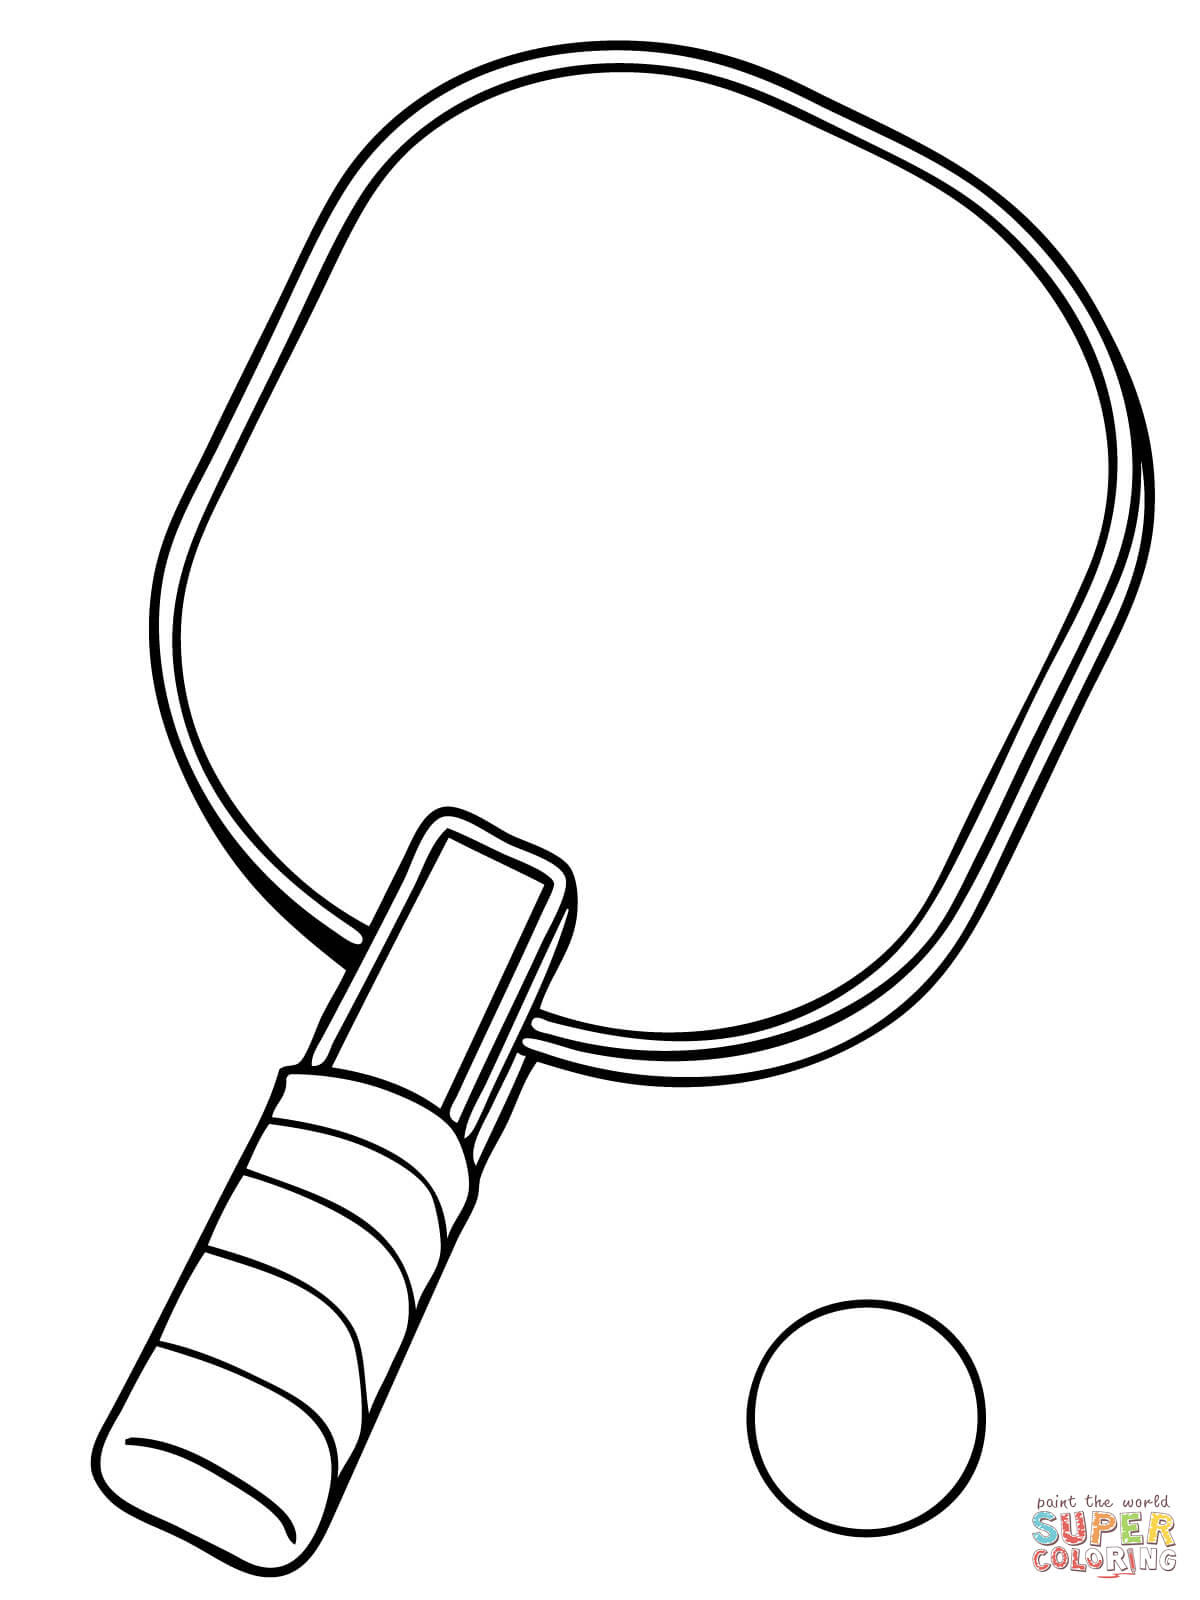 Dibujo De Paleta Y Pelota De Tenis De Mesa Para Colorear Dibujos